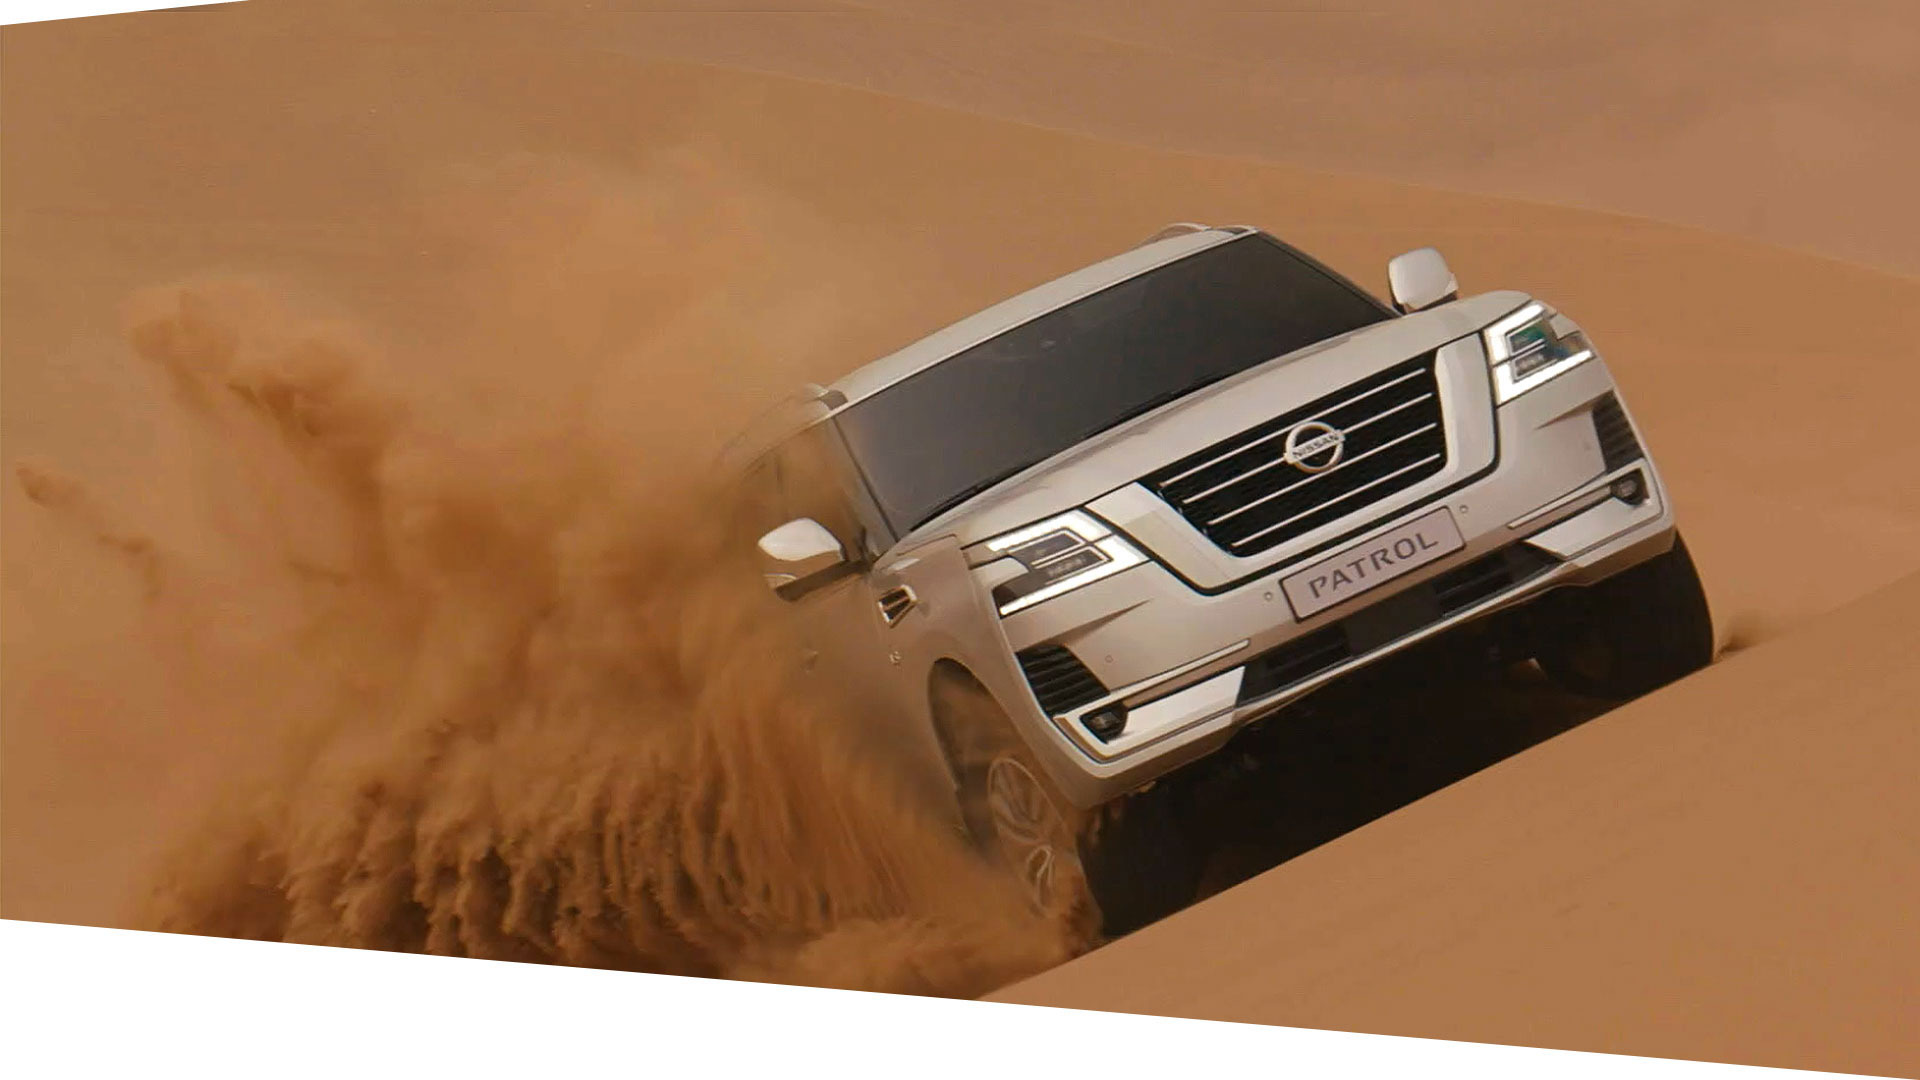 2020 Patrol Nissan SUV dune-bashing in desert